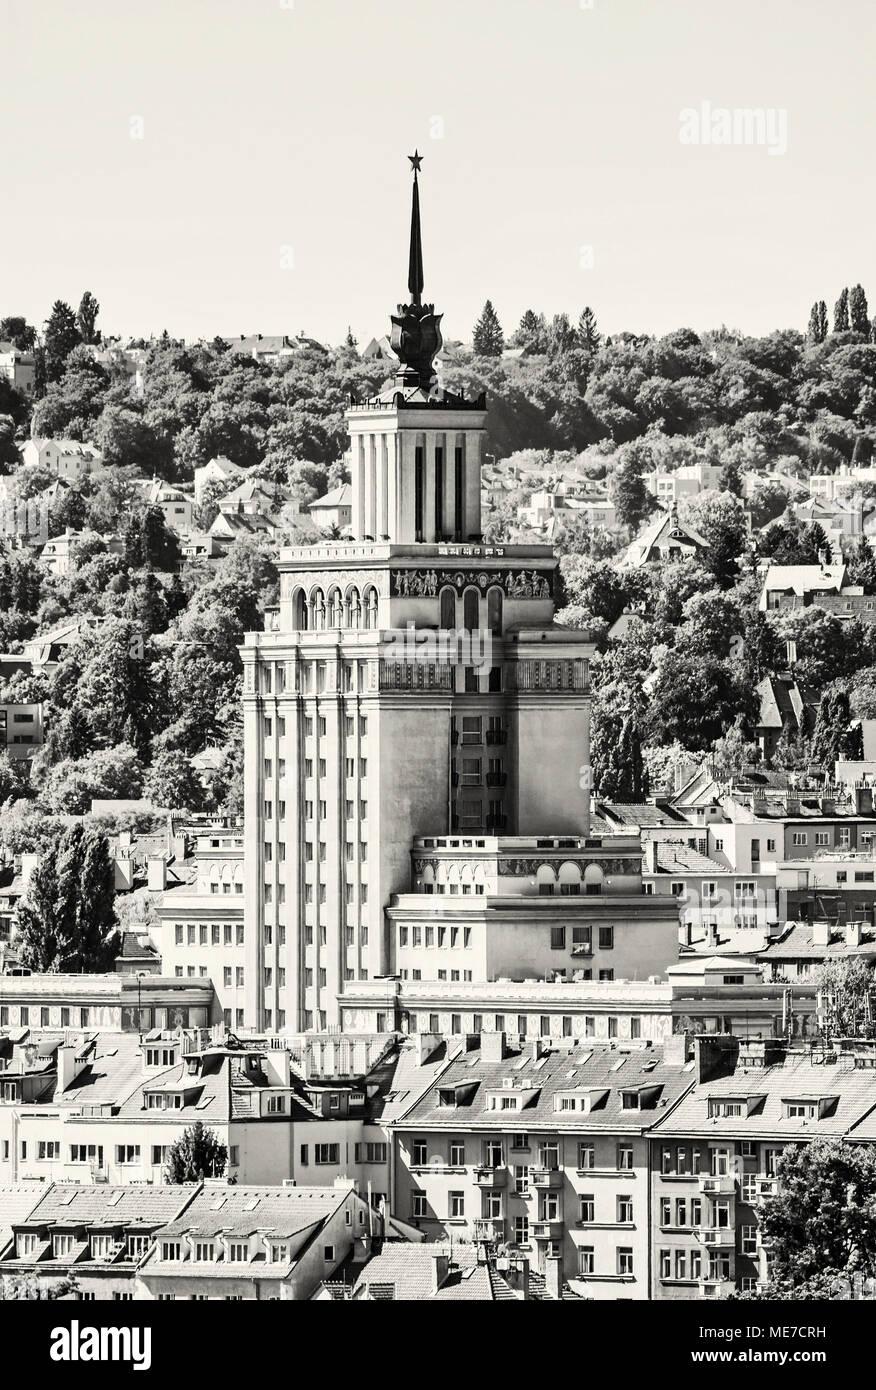 Hotel International Prague Czech Republic Architectural